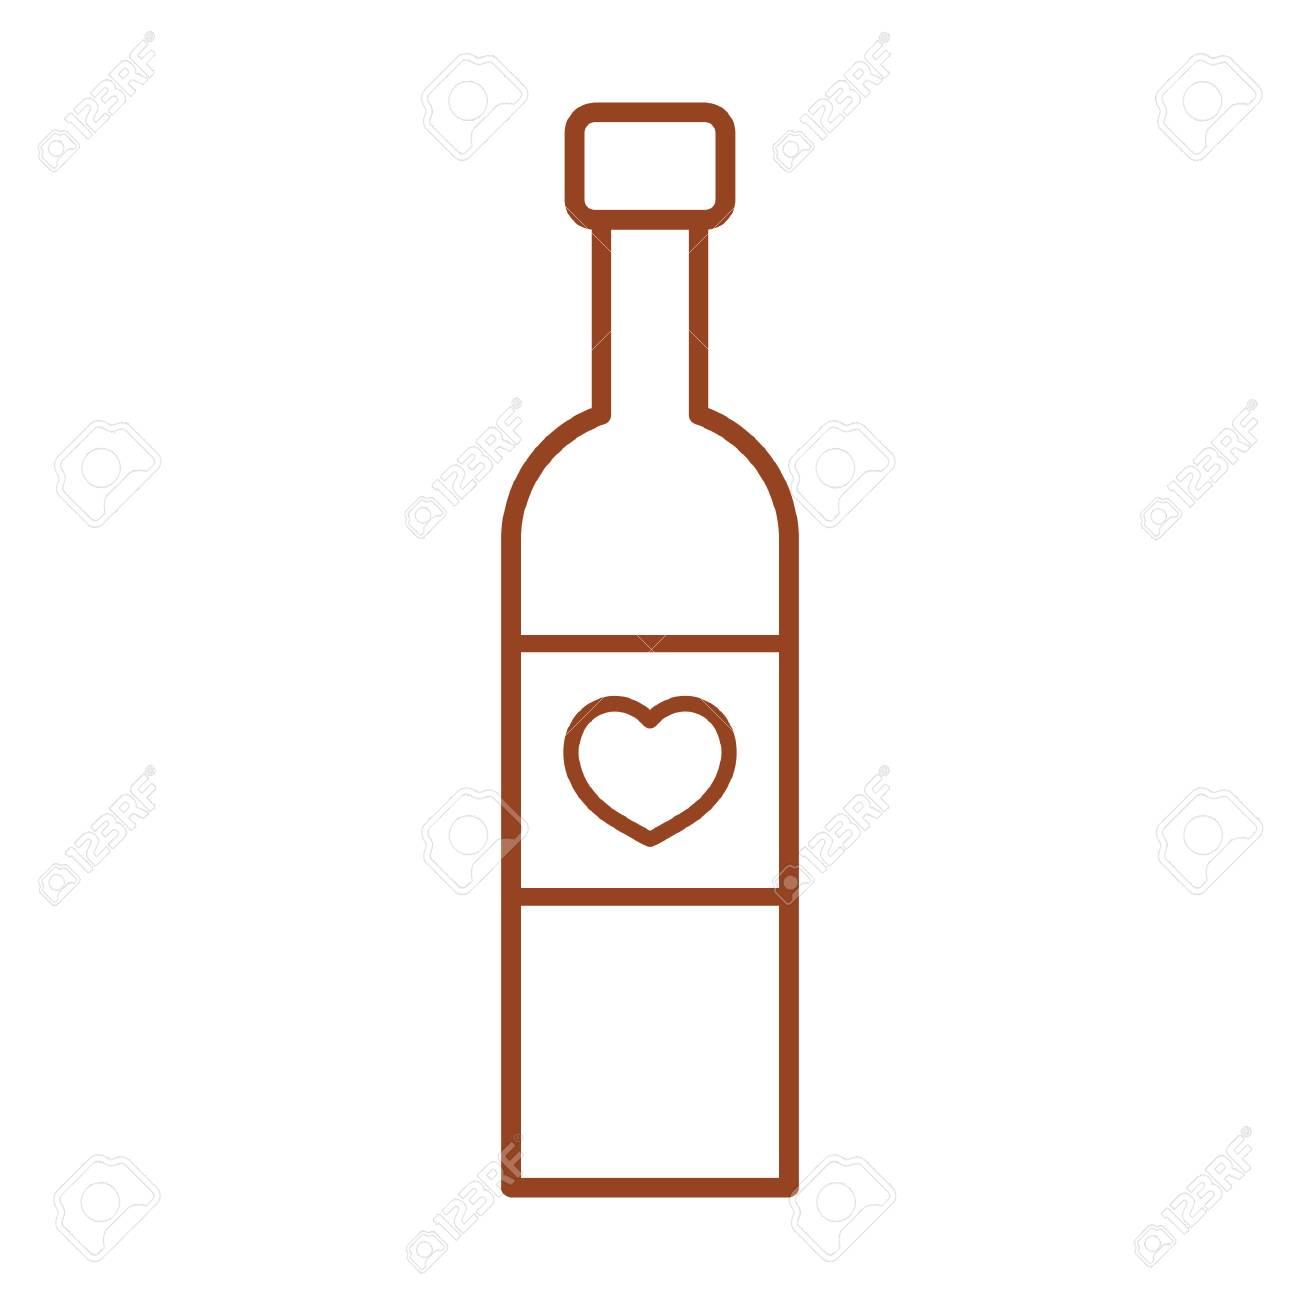 wine bottle with heart - 52573253